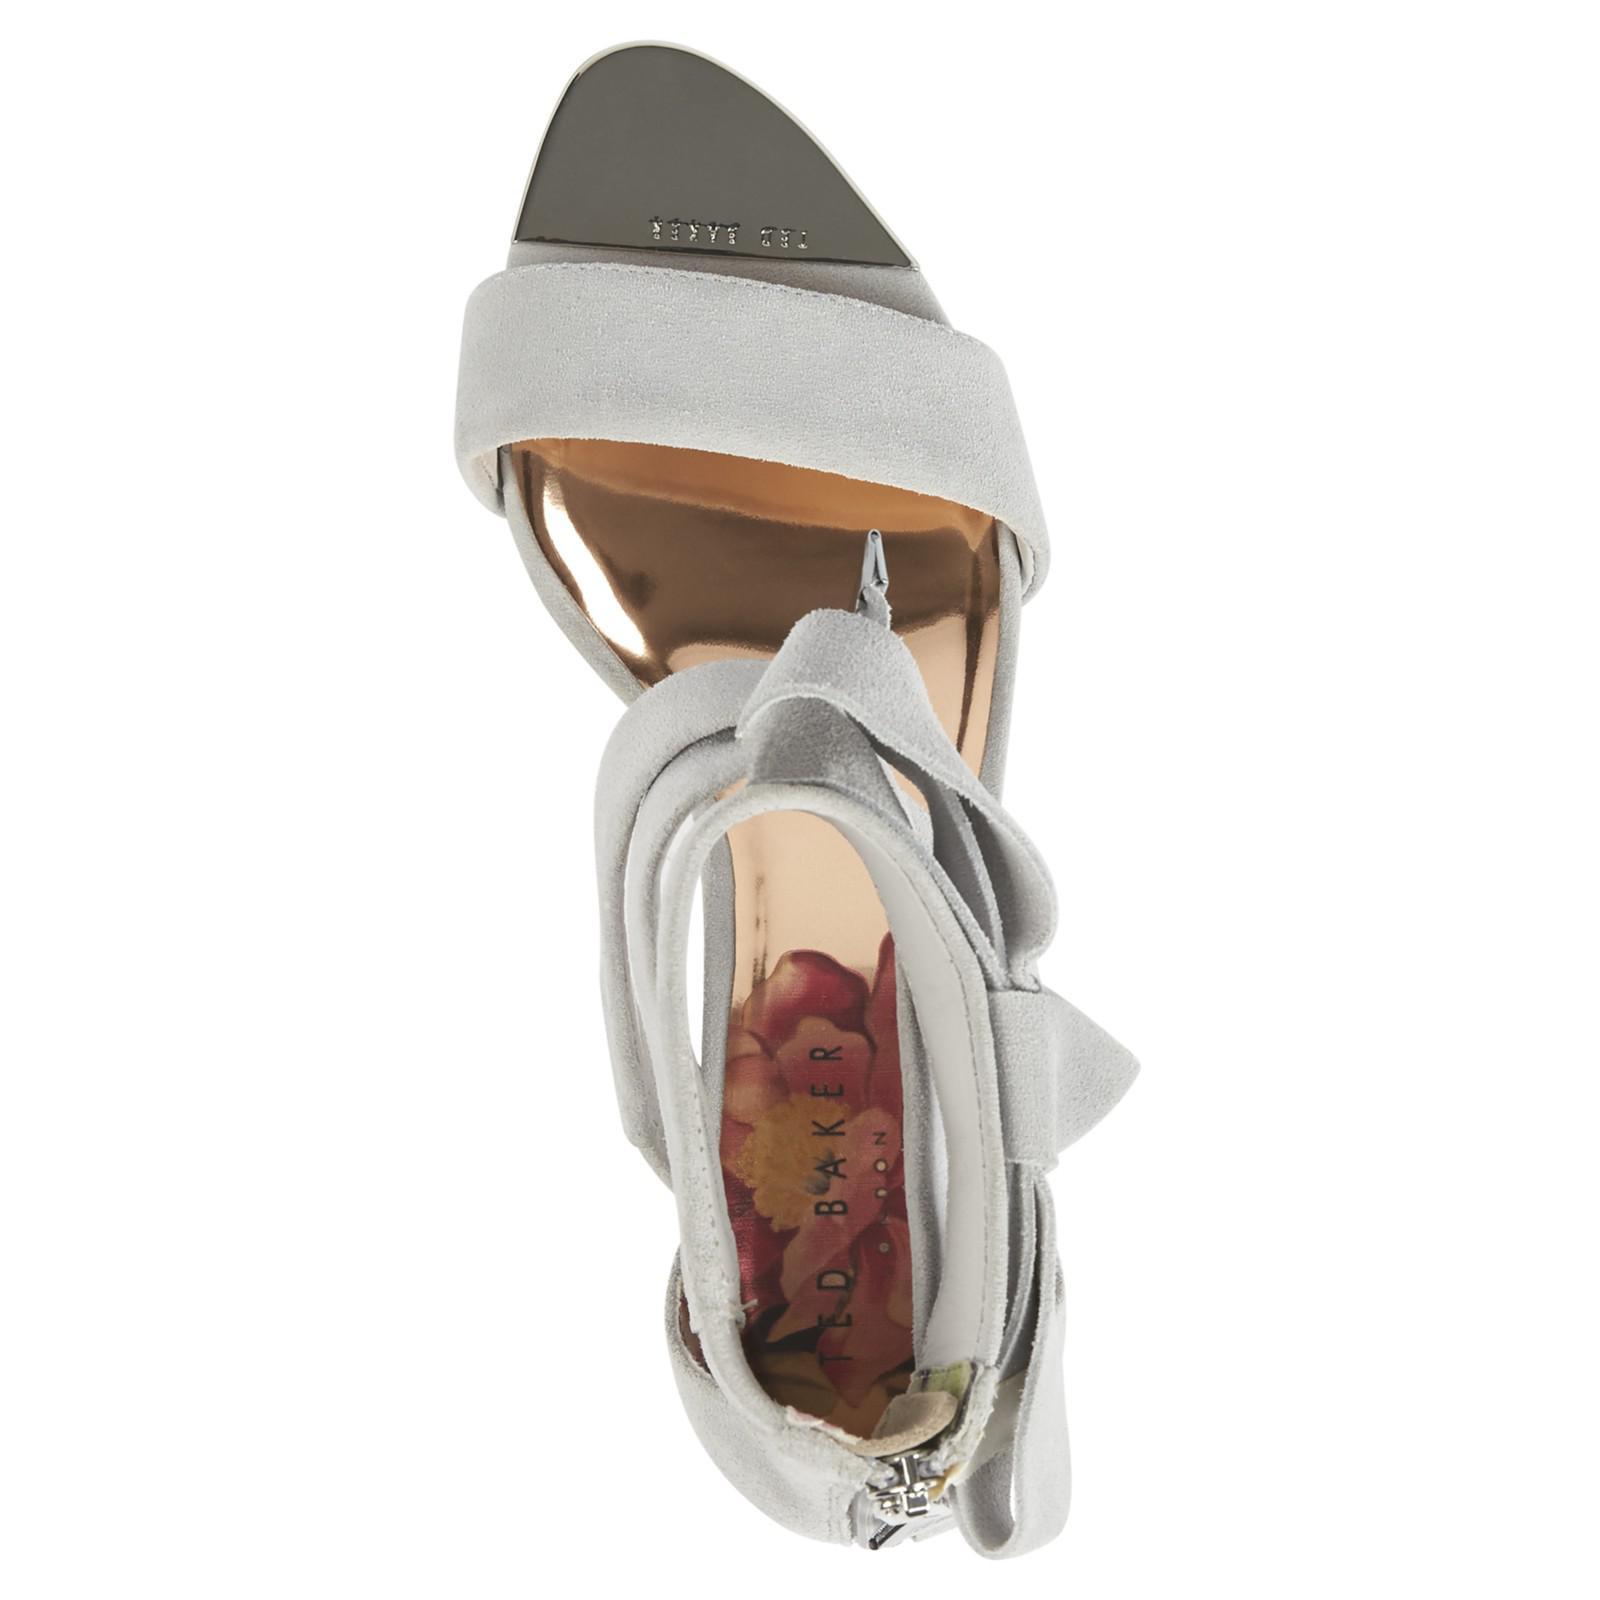 5ecef05ce Ted Baker Noxen Cross Strap Bow Sandals - Lyst